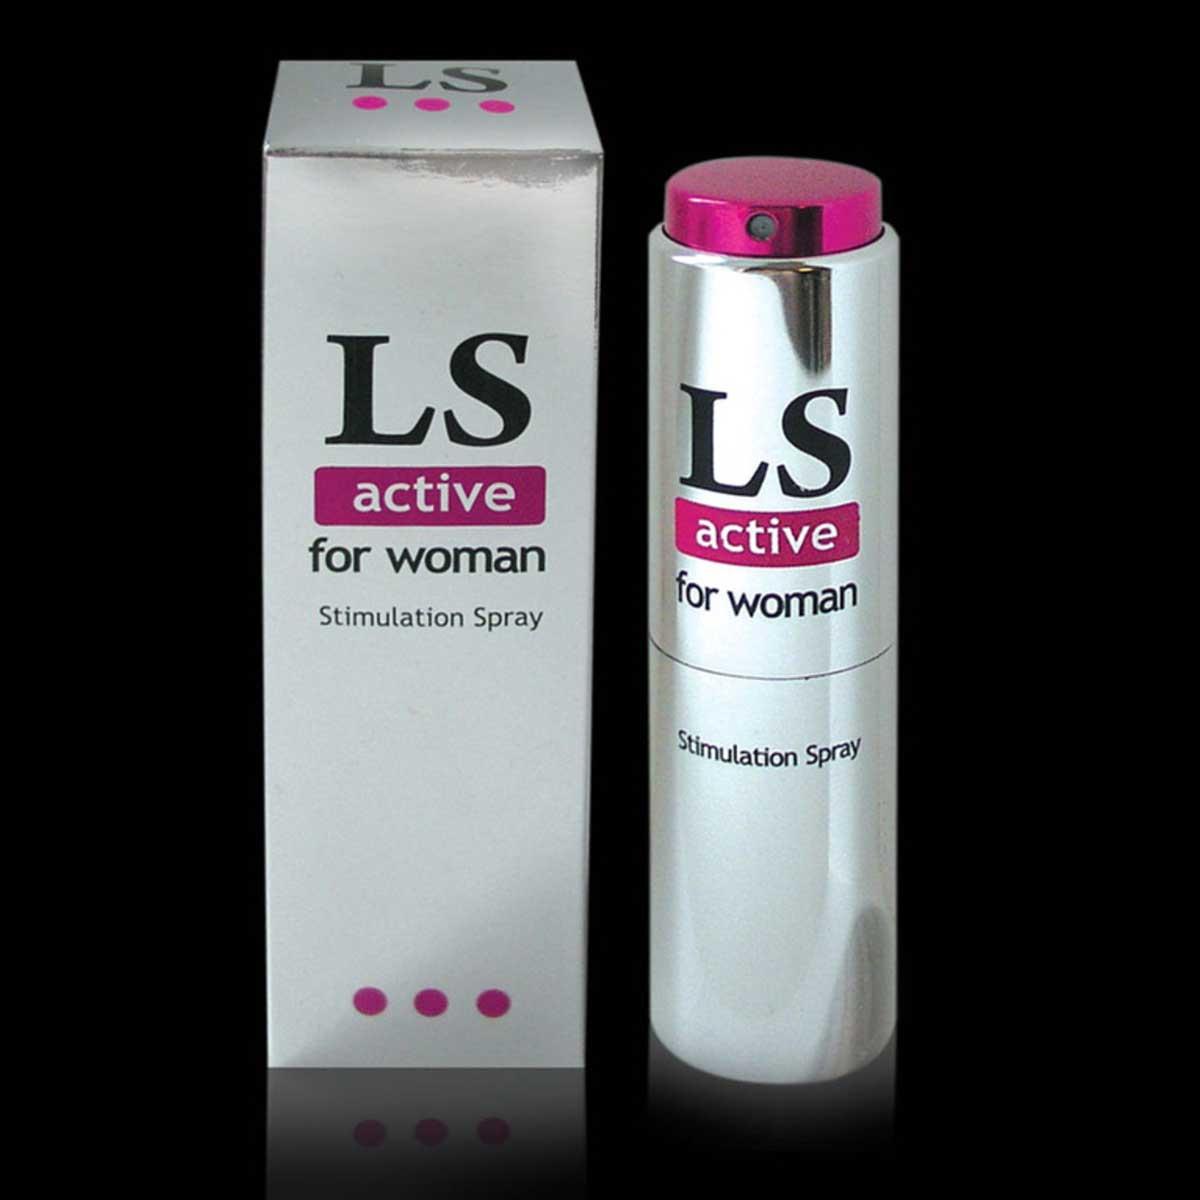 Спрей-стимулятор для женщин Lovespray Active Woman - 18 мл. - фото 223401